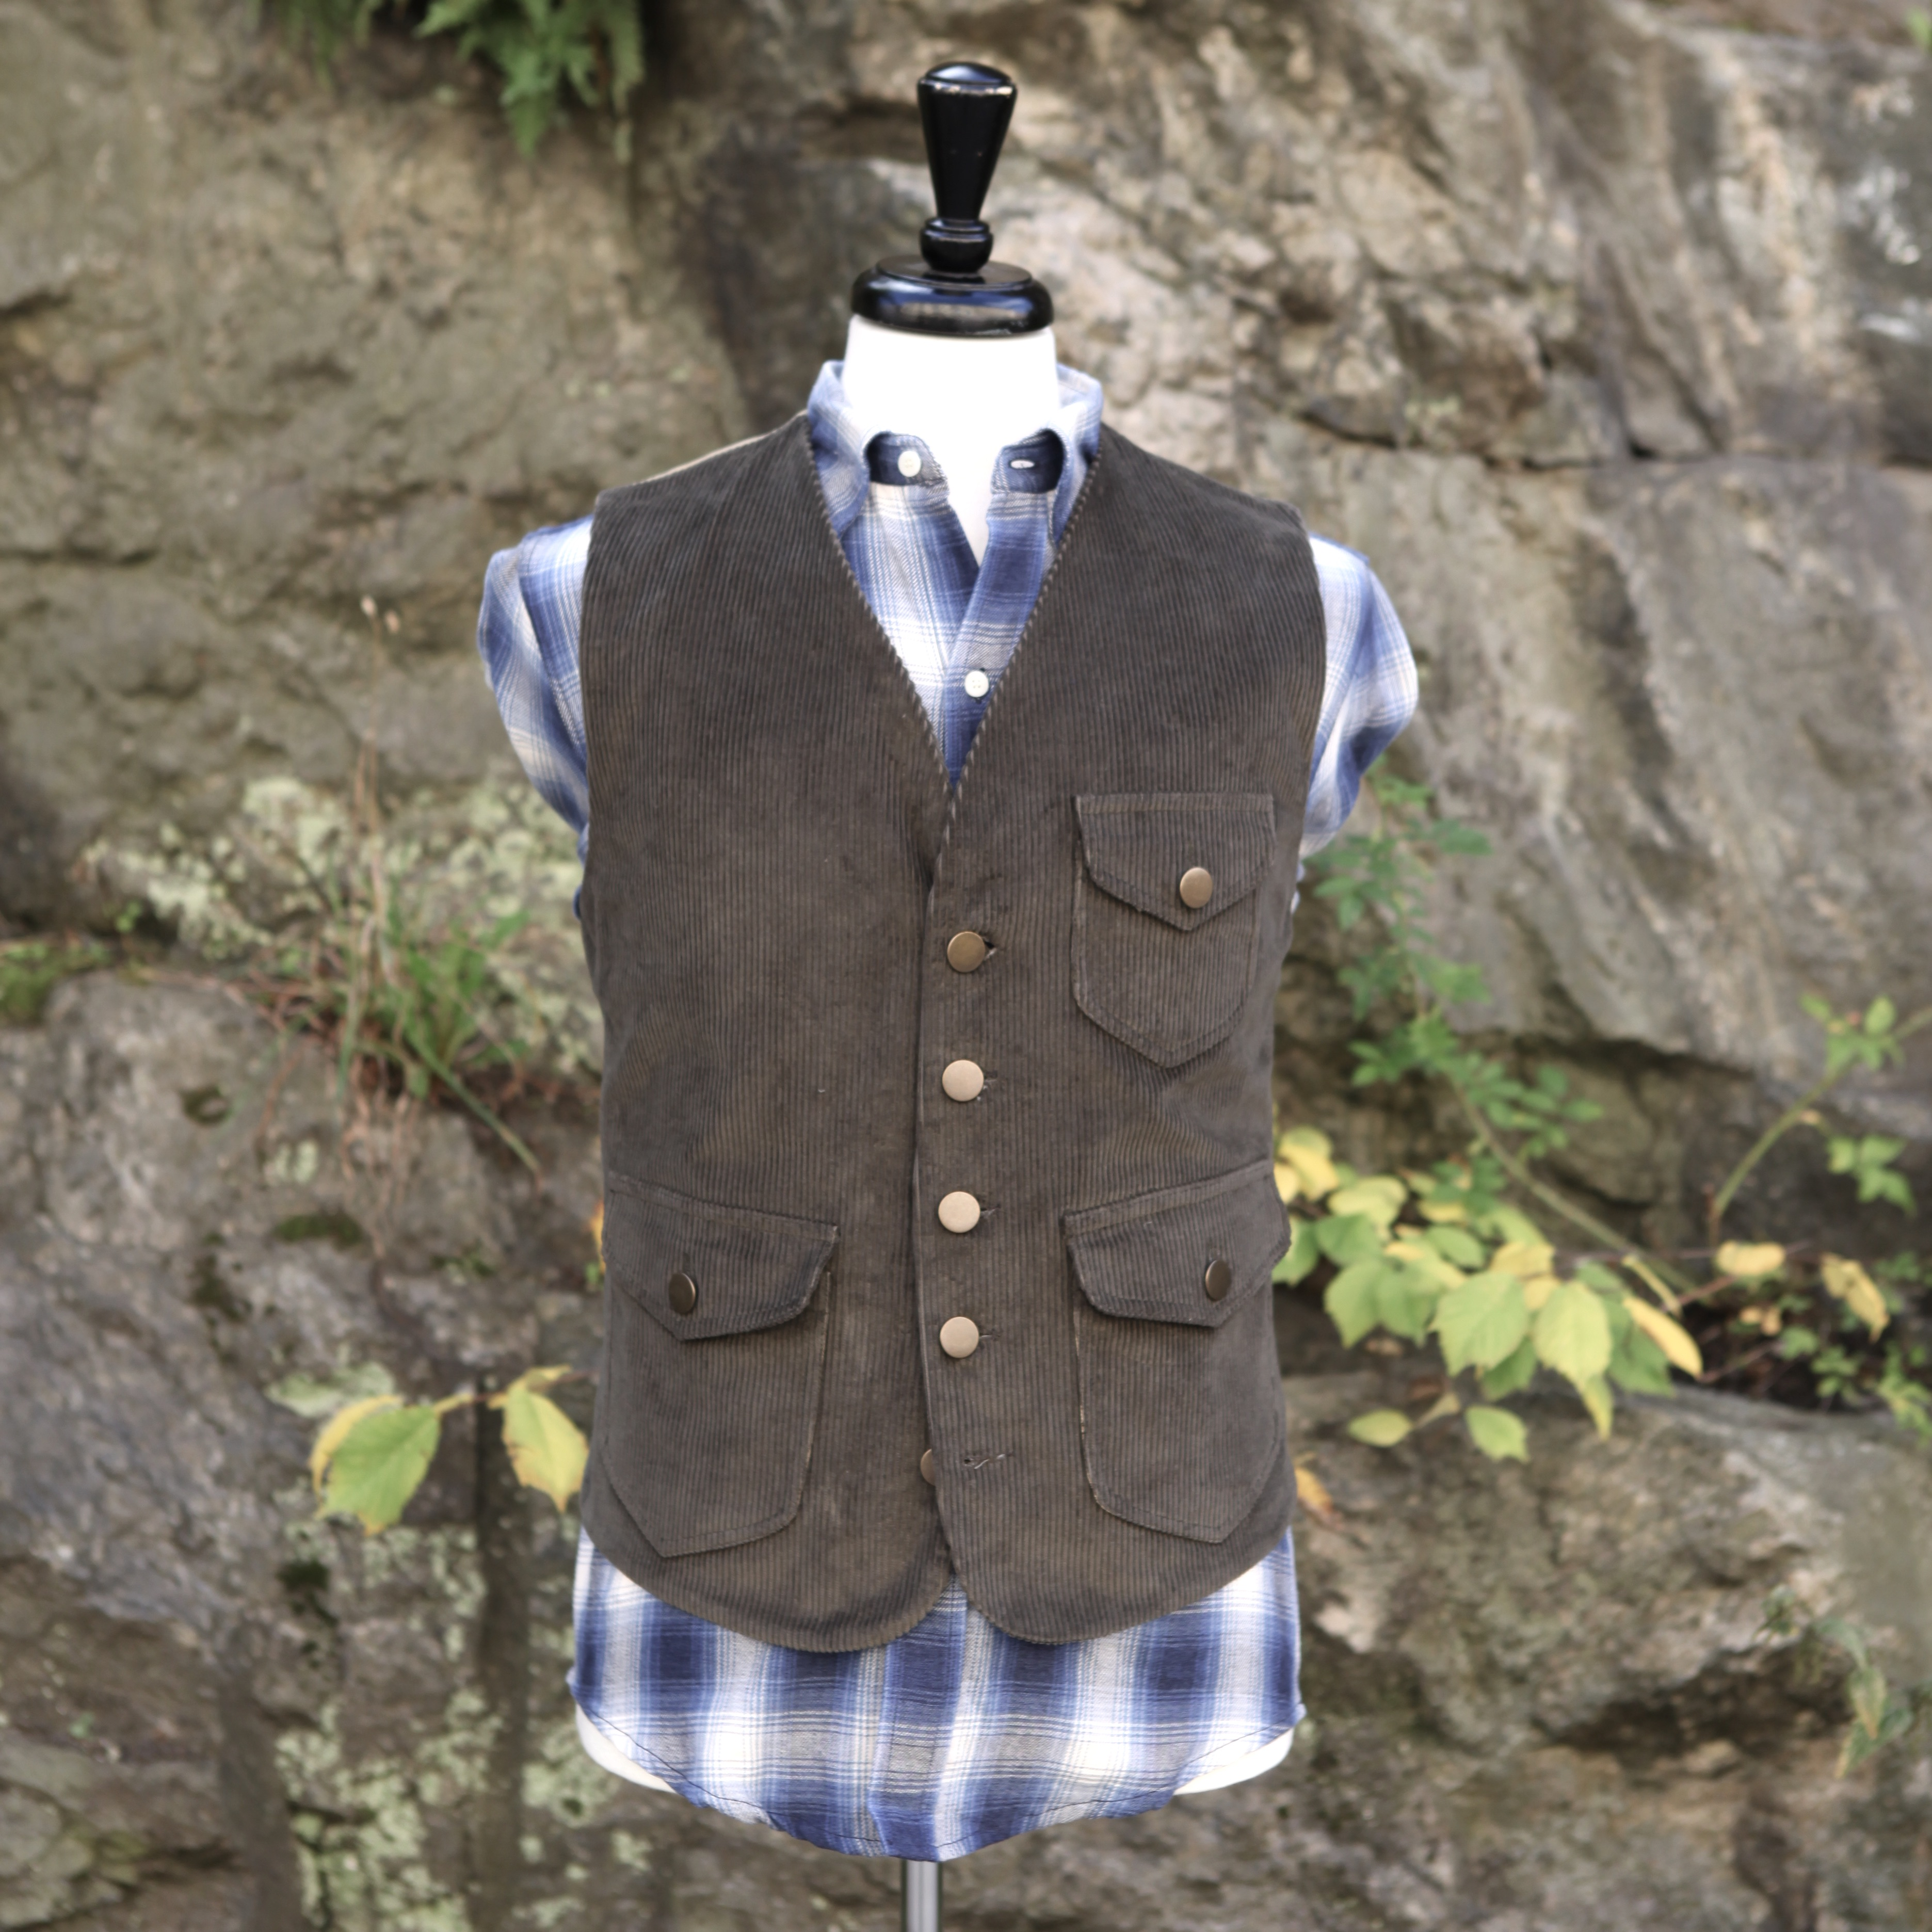 Tonton Olive Corduroy and khaki vest